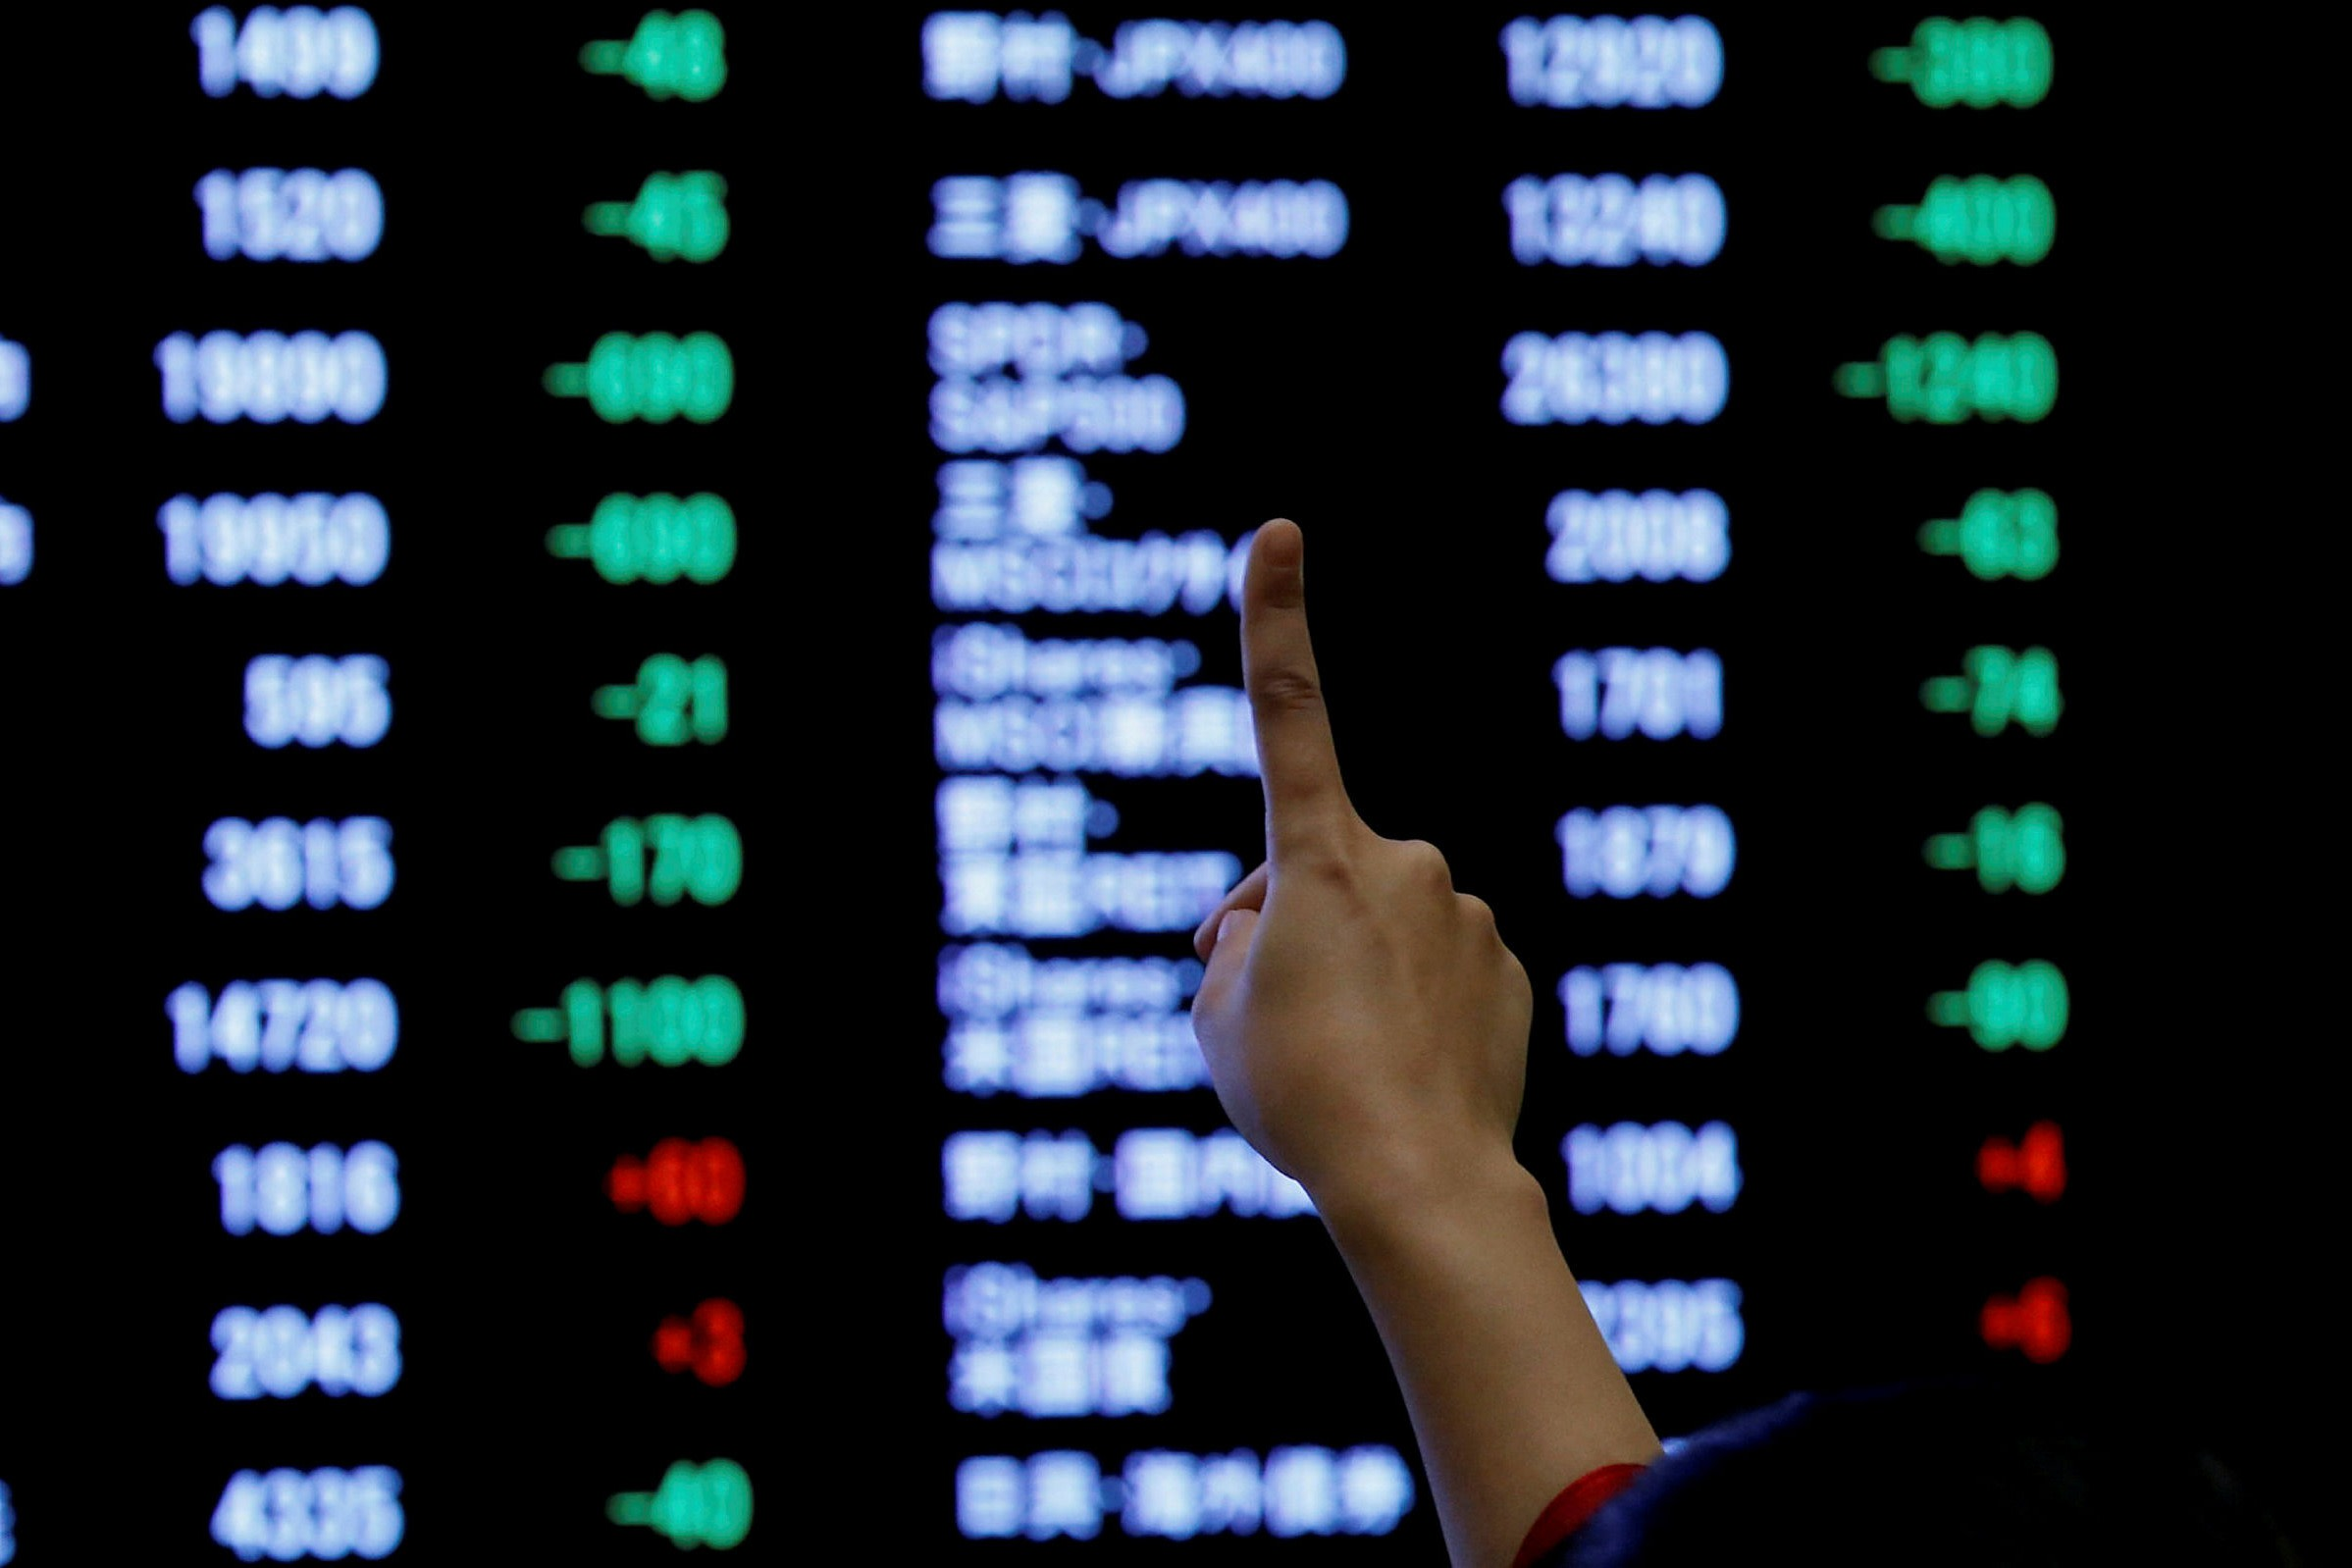 Japan's Topix dropped 1.1 per cent while Australia's S&P/ASX 200 and South Korea's Kospi both fell 0.4 per cent